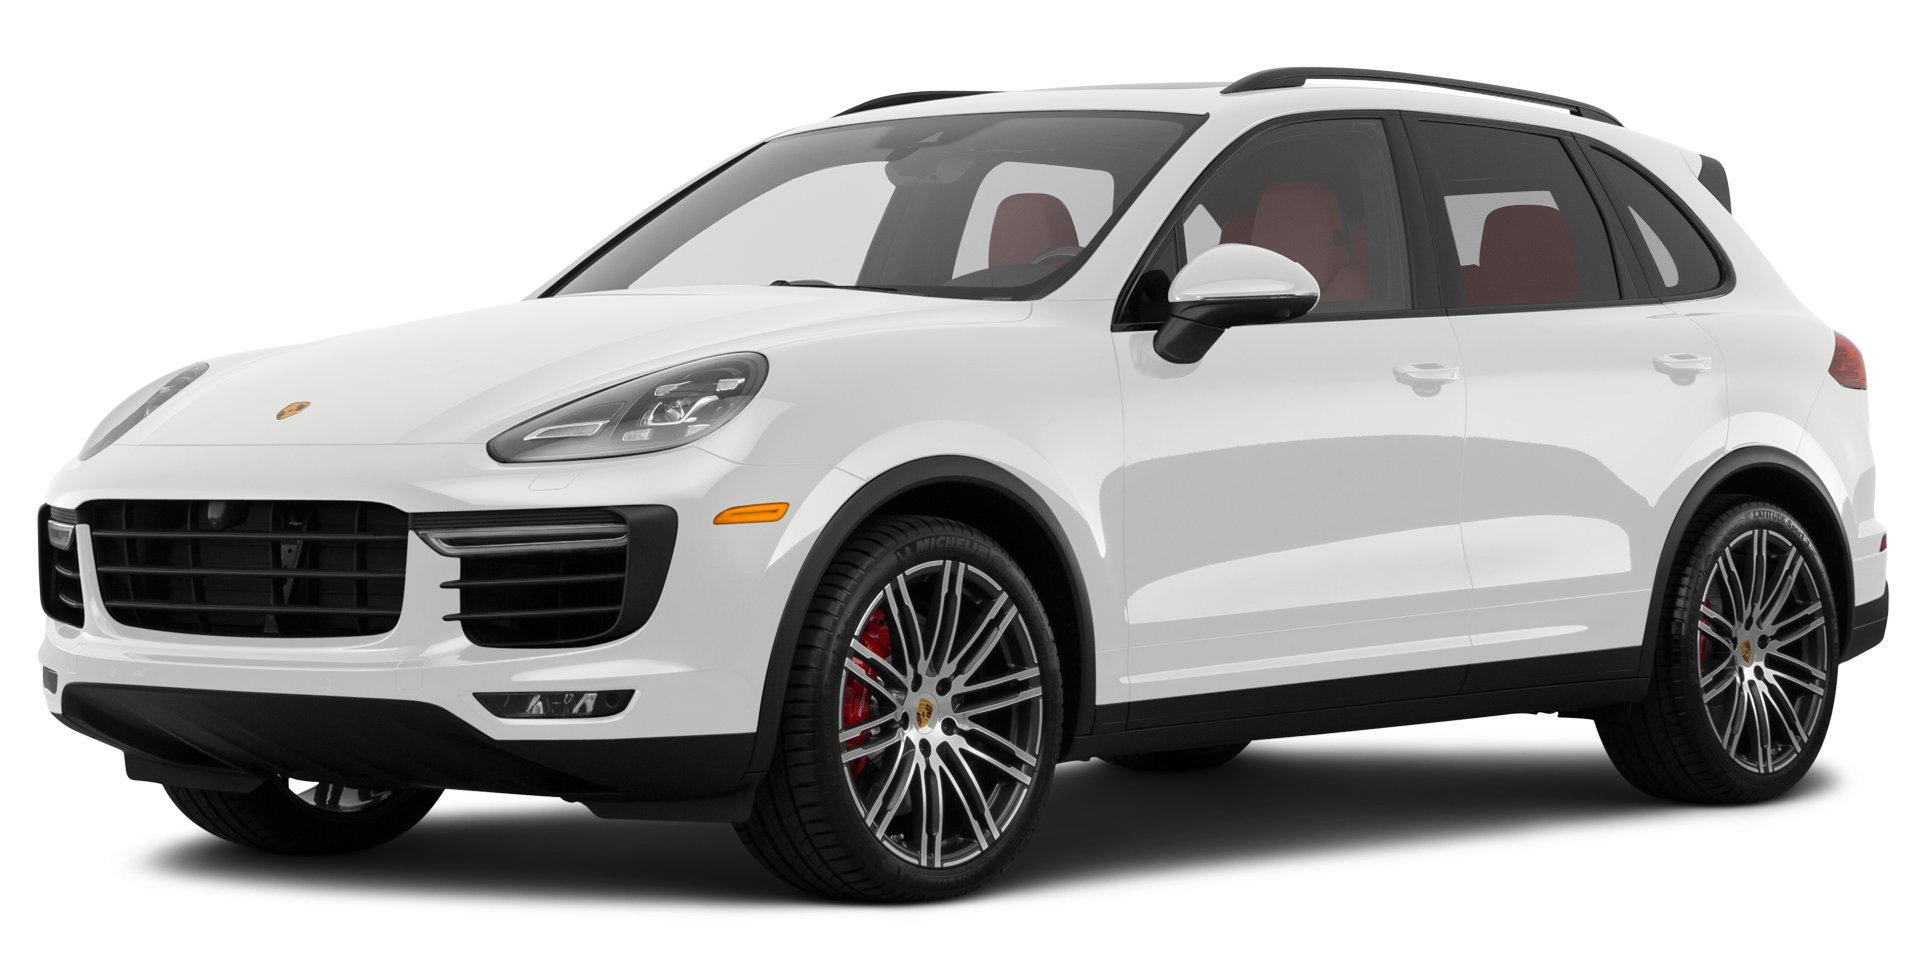 ... 2017 Porsche Cayenne Turbo, All Wheel Drive ...